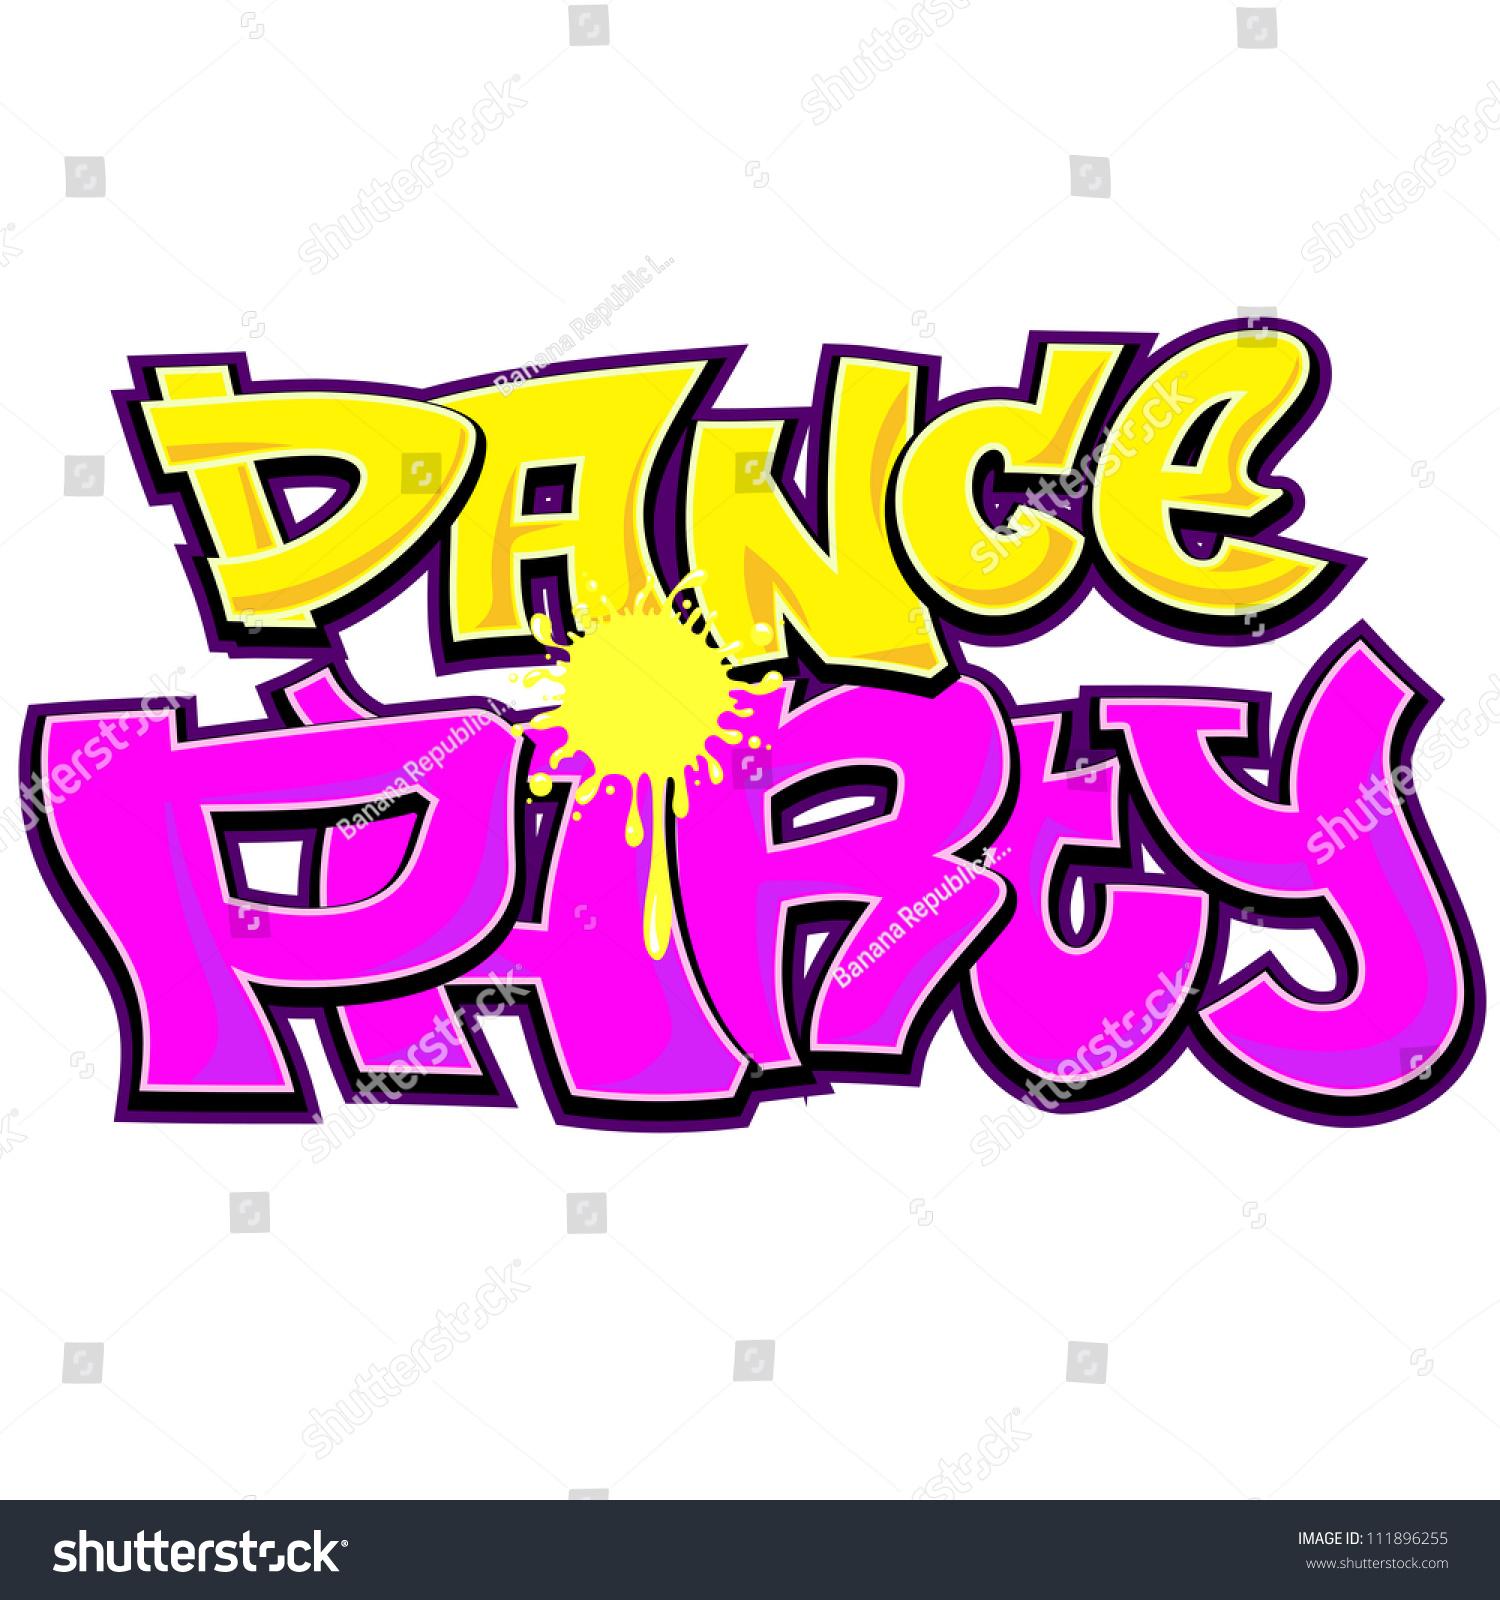 Graffiti art designs - Dance Party Graffiti Urban Art Design